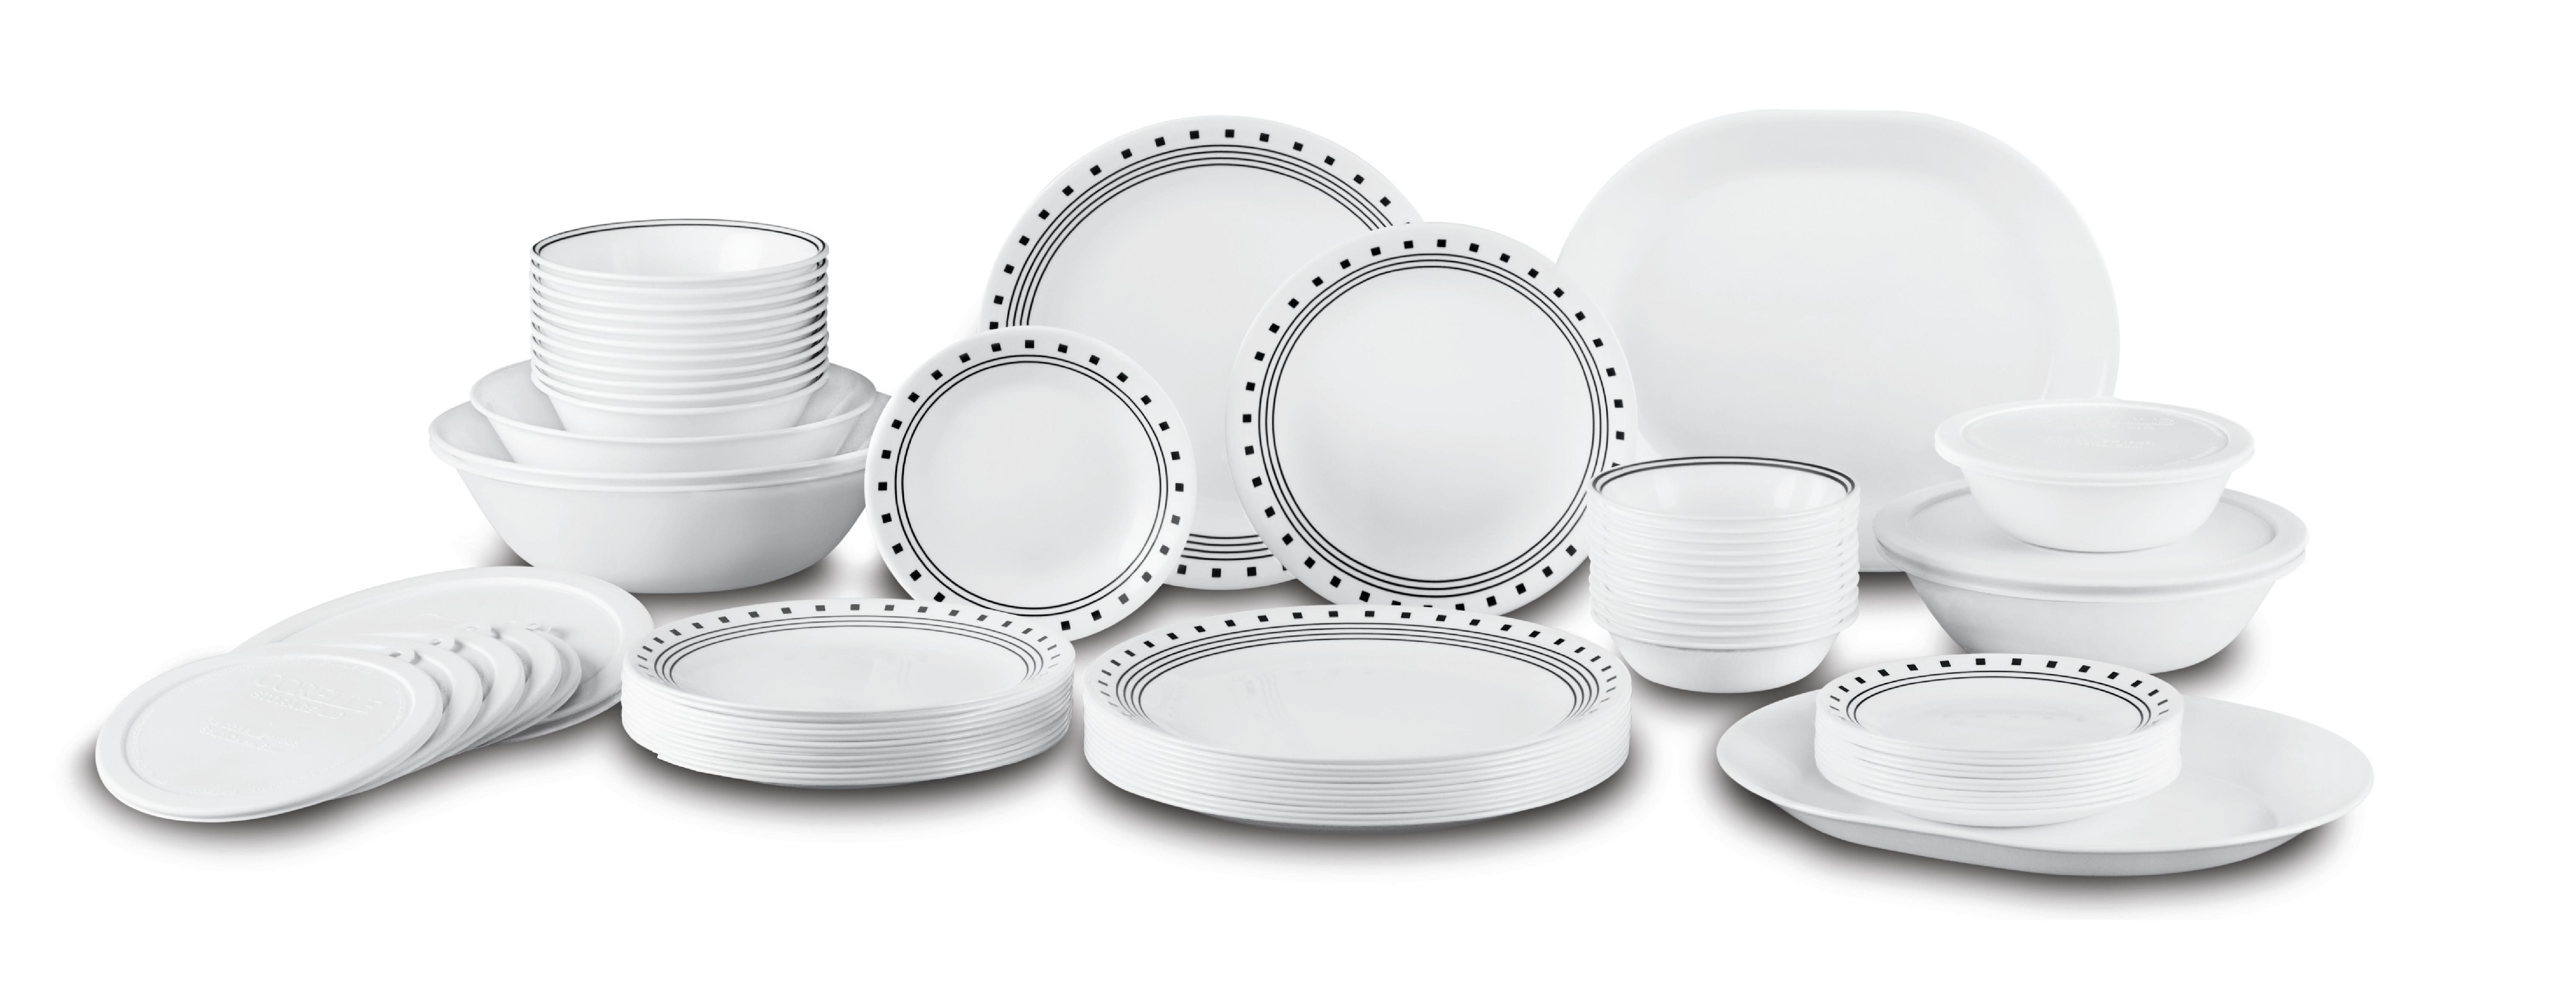 Amazon Com Corelle City Block Dinnerware Set With Lids